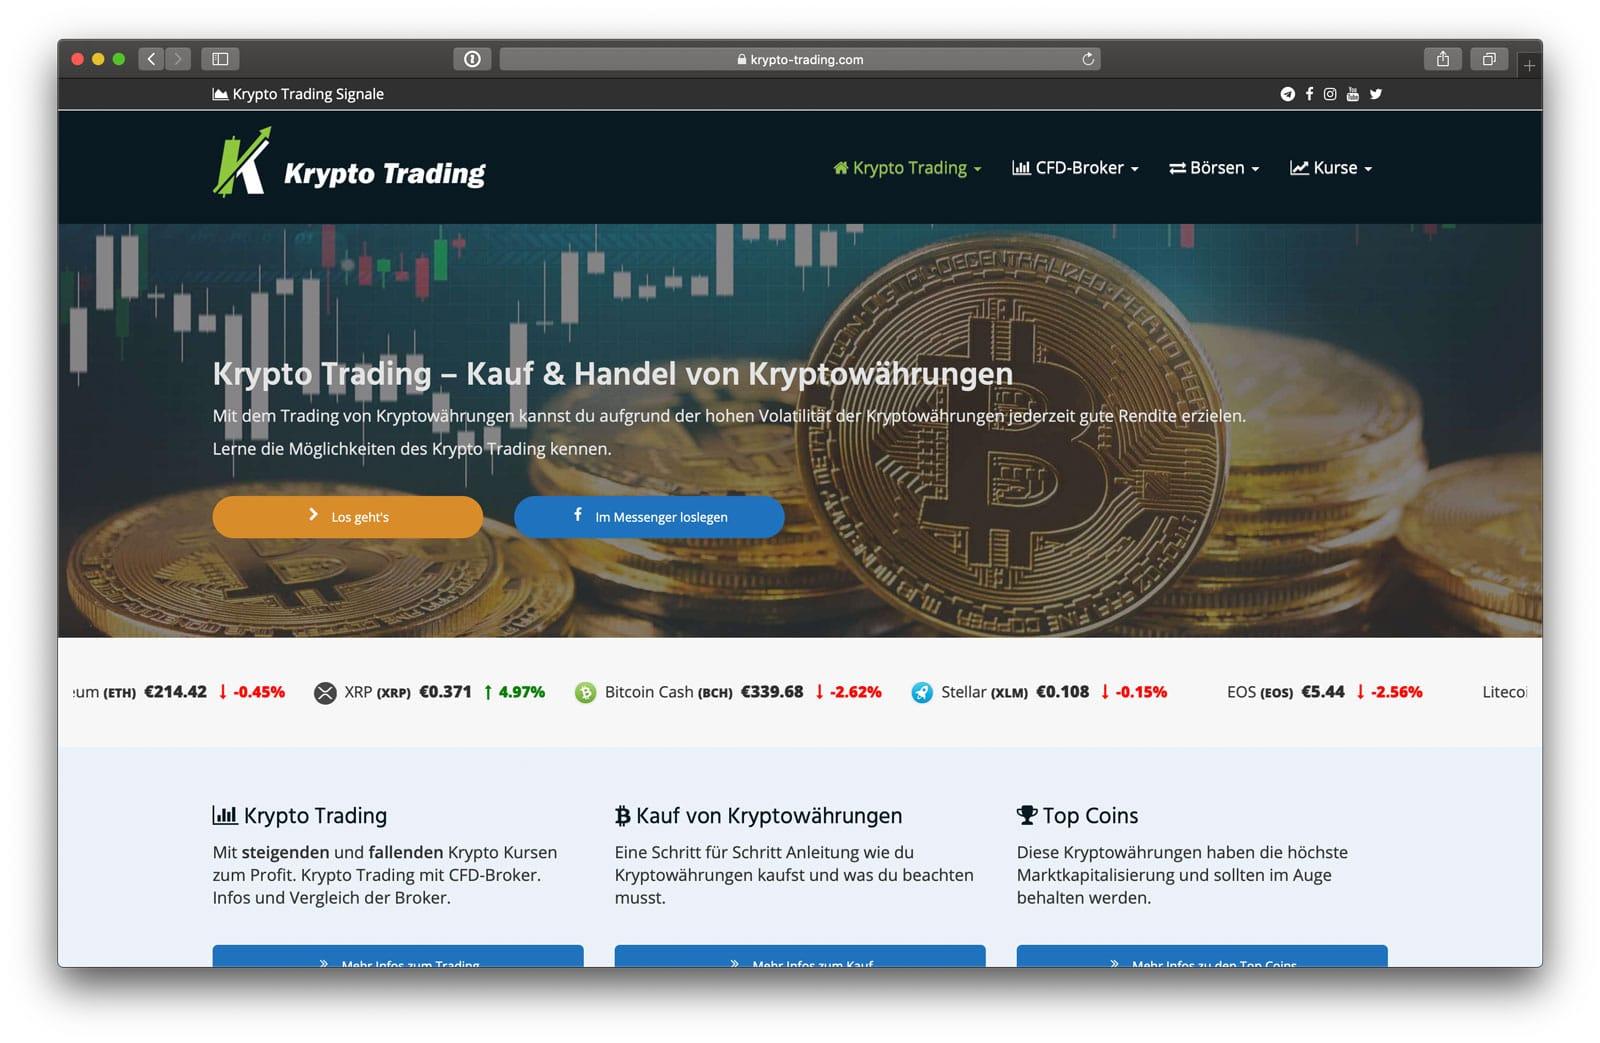 Krypto Trading Webseite 2019